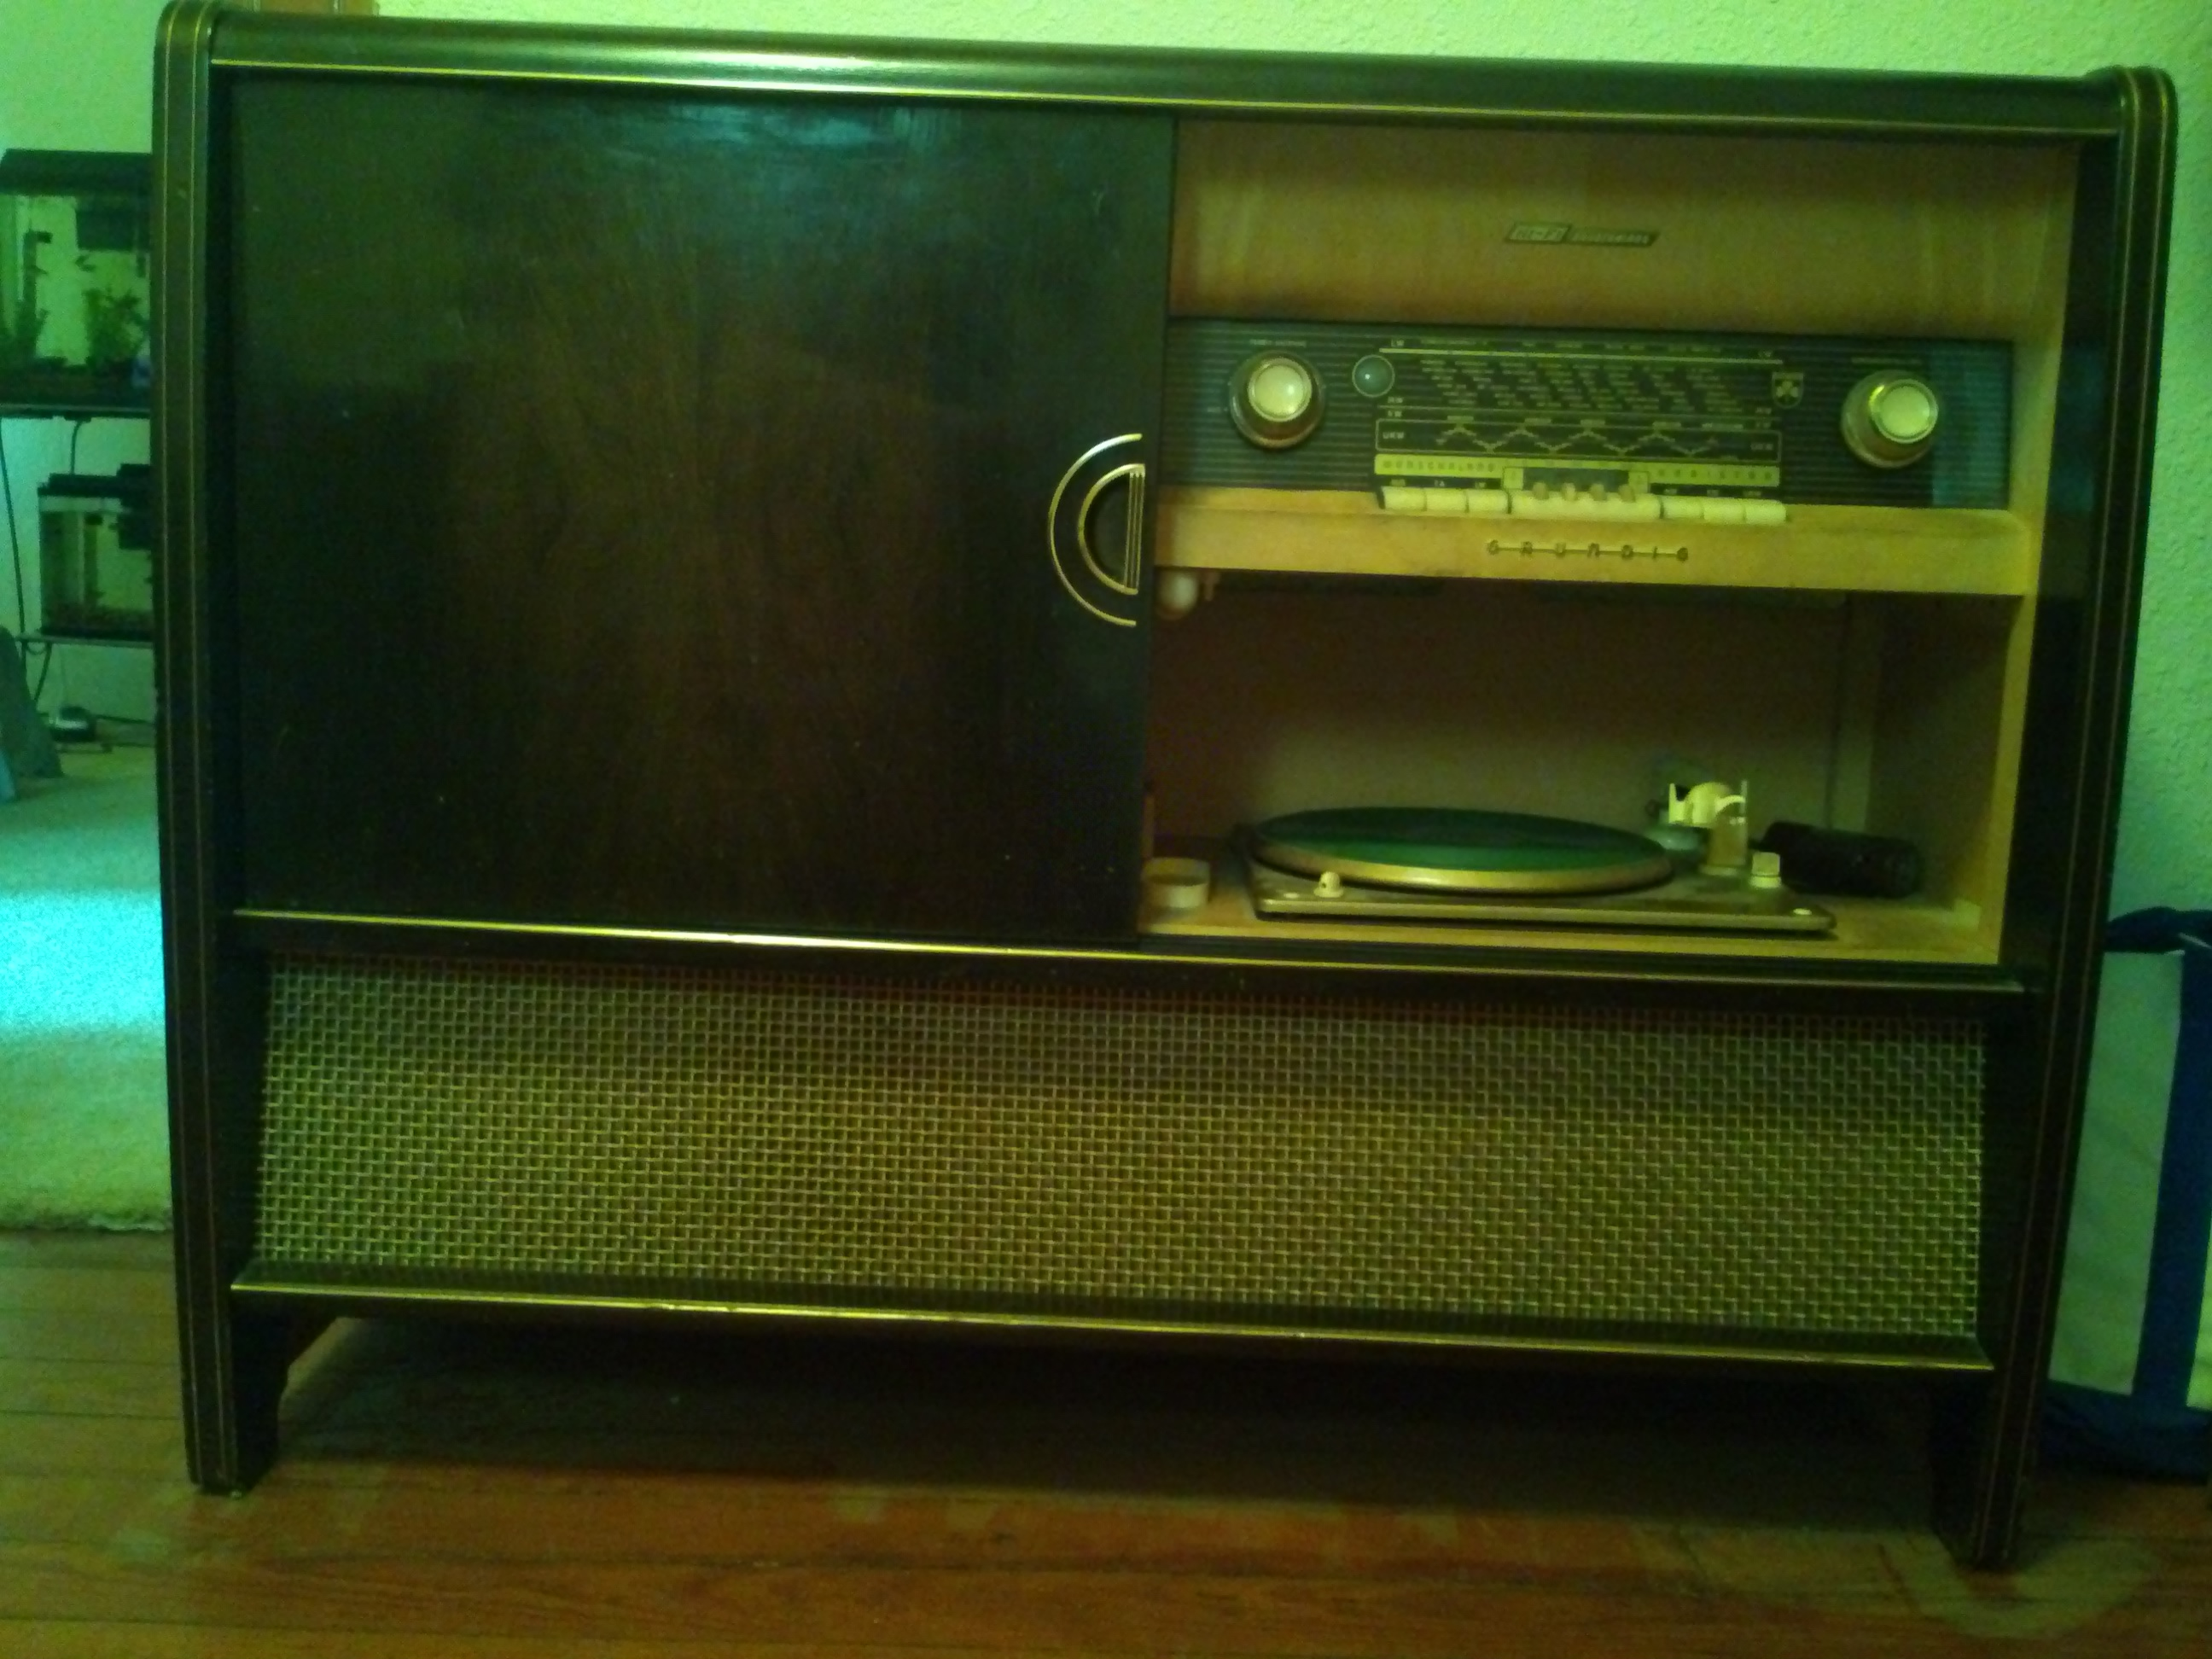 German Musikschrand 7066 Radio Console antique appraisal | InstAppraisal